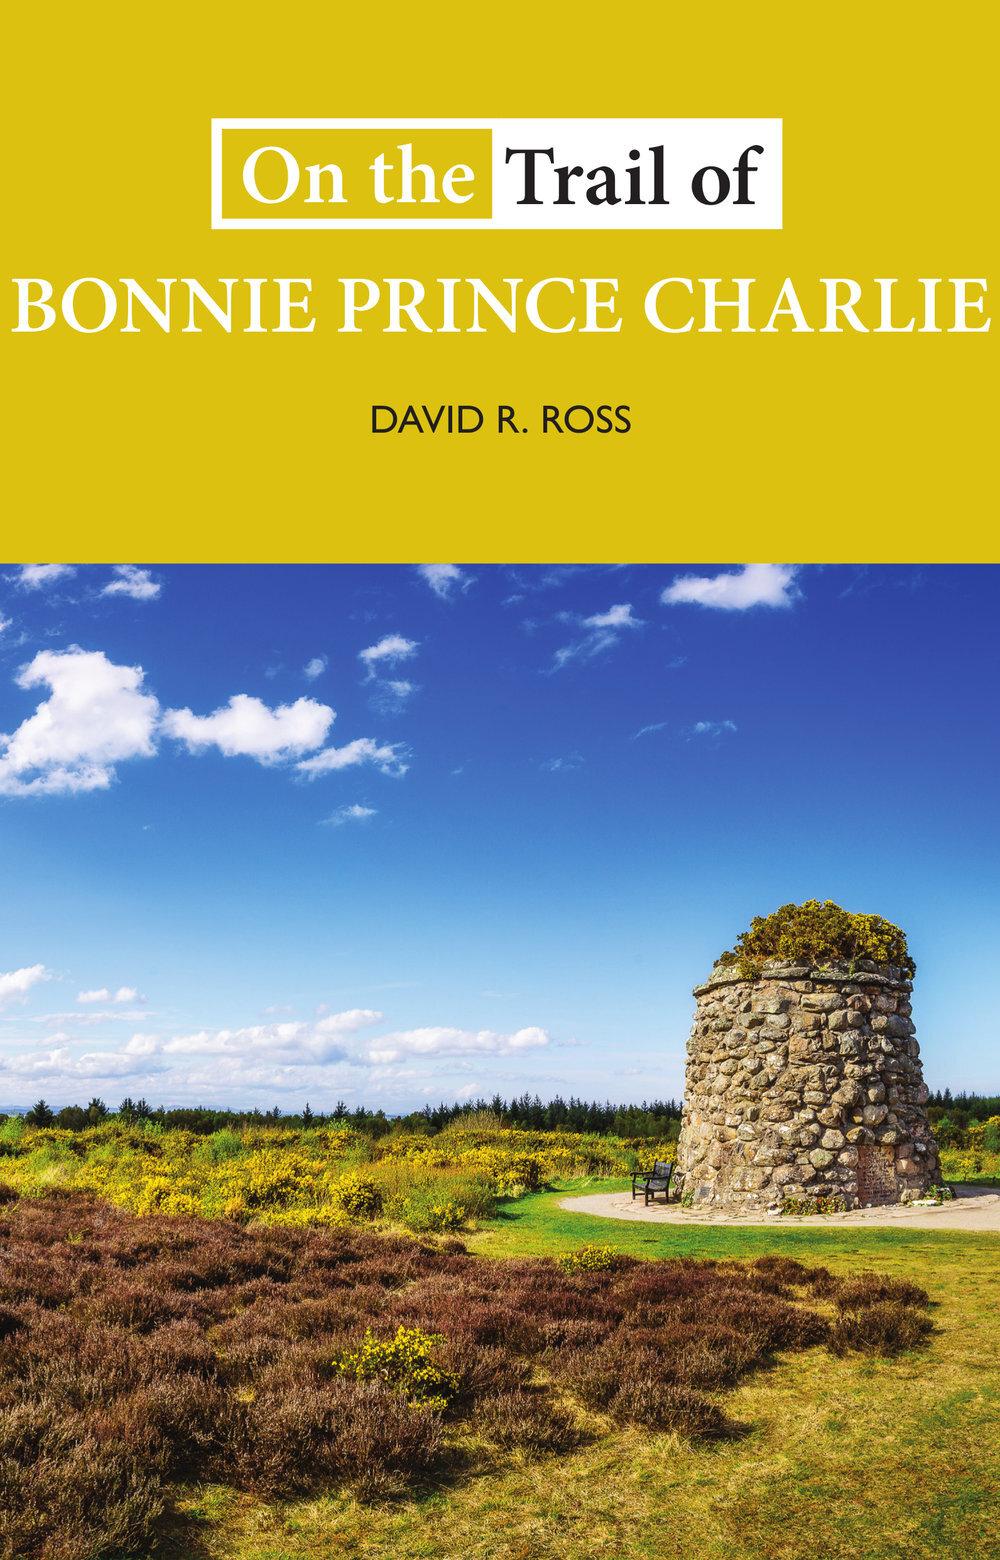 On+the+Trail+Bonnie+Prince+Charlie+David+R+Ross+9781913025090+Luath+Press.jpg